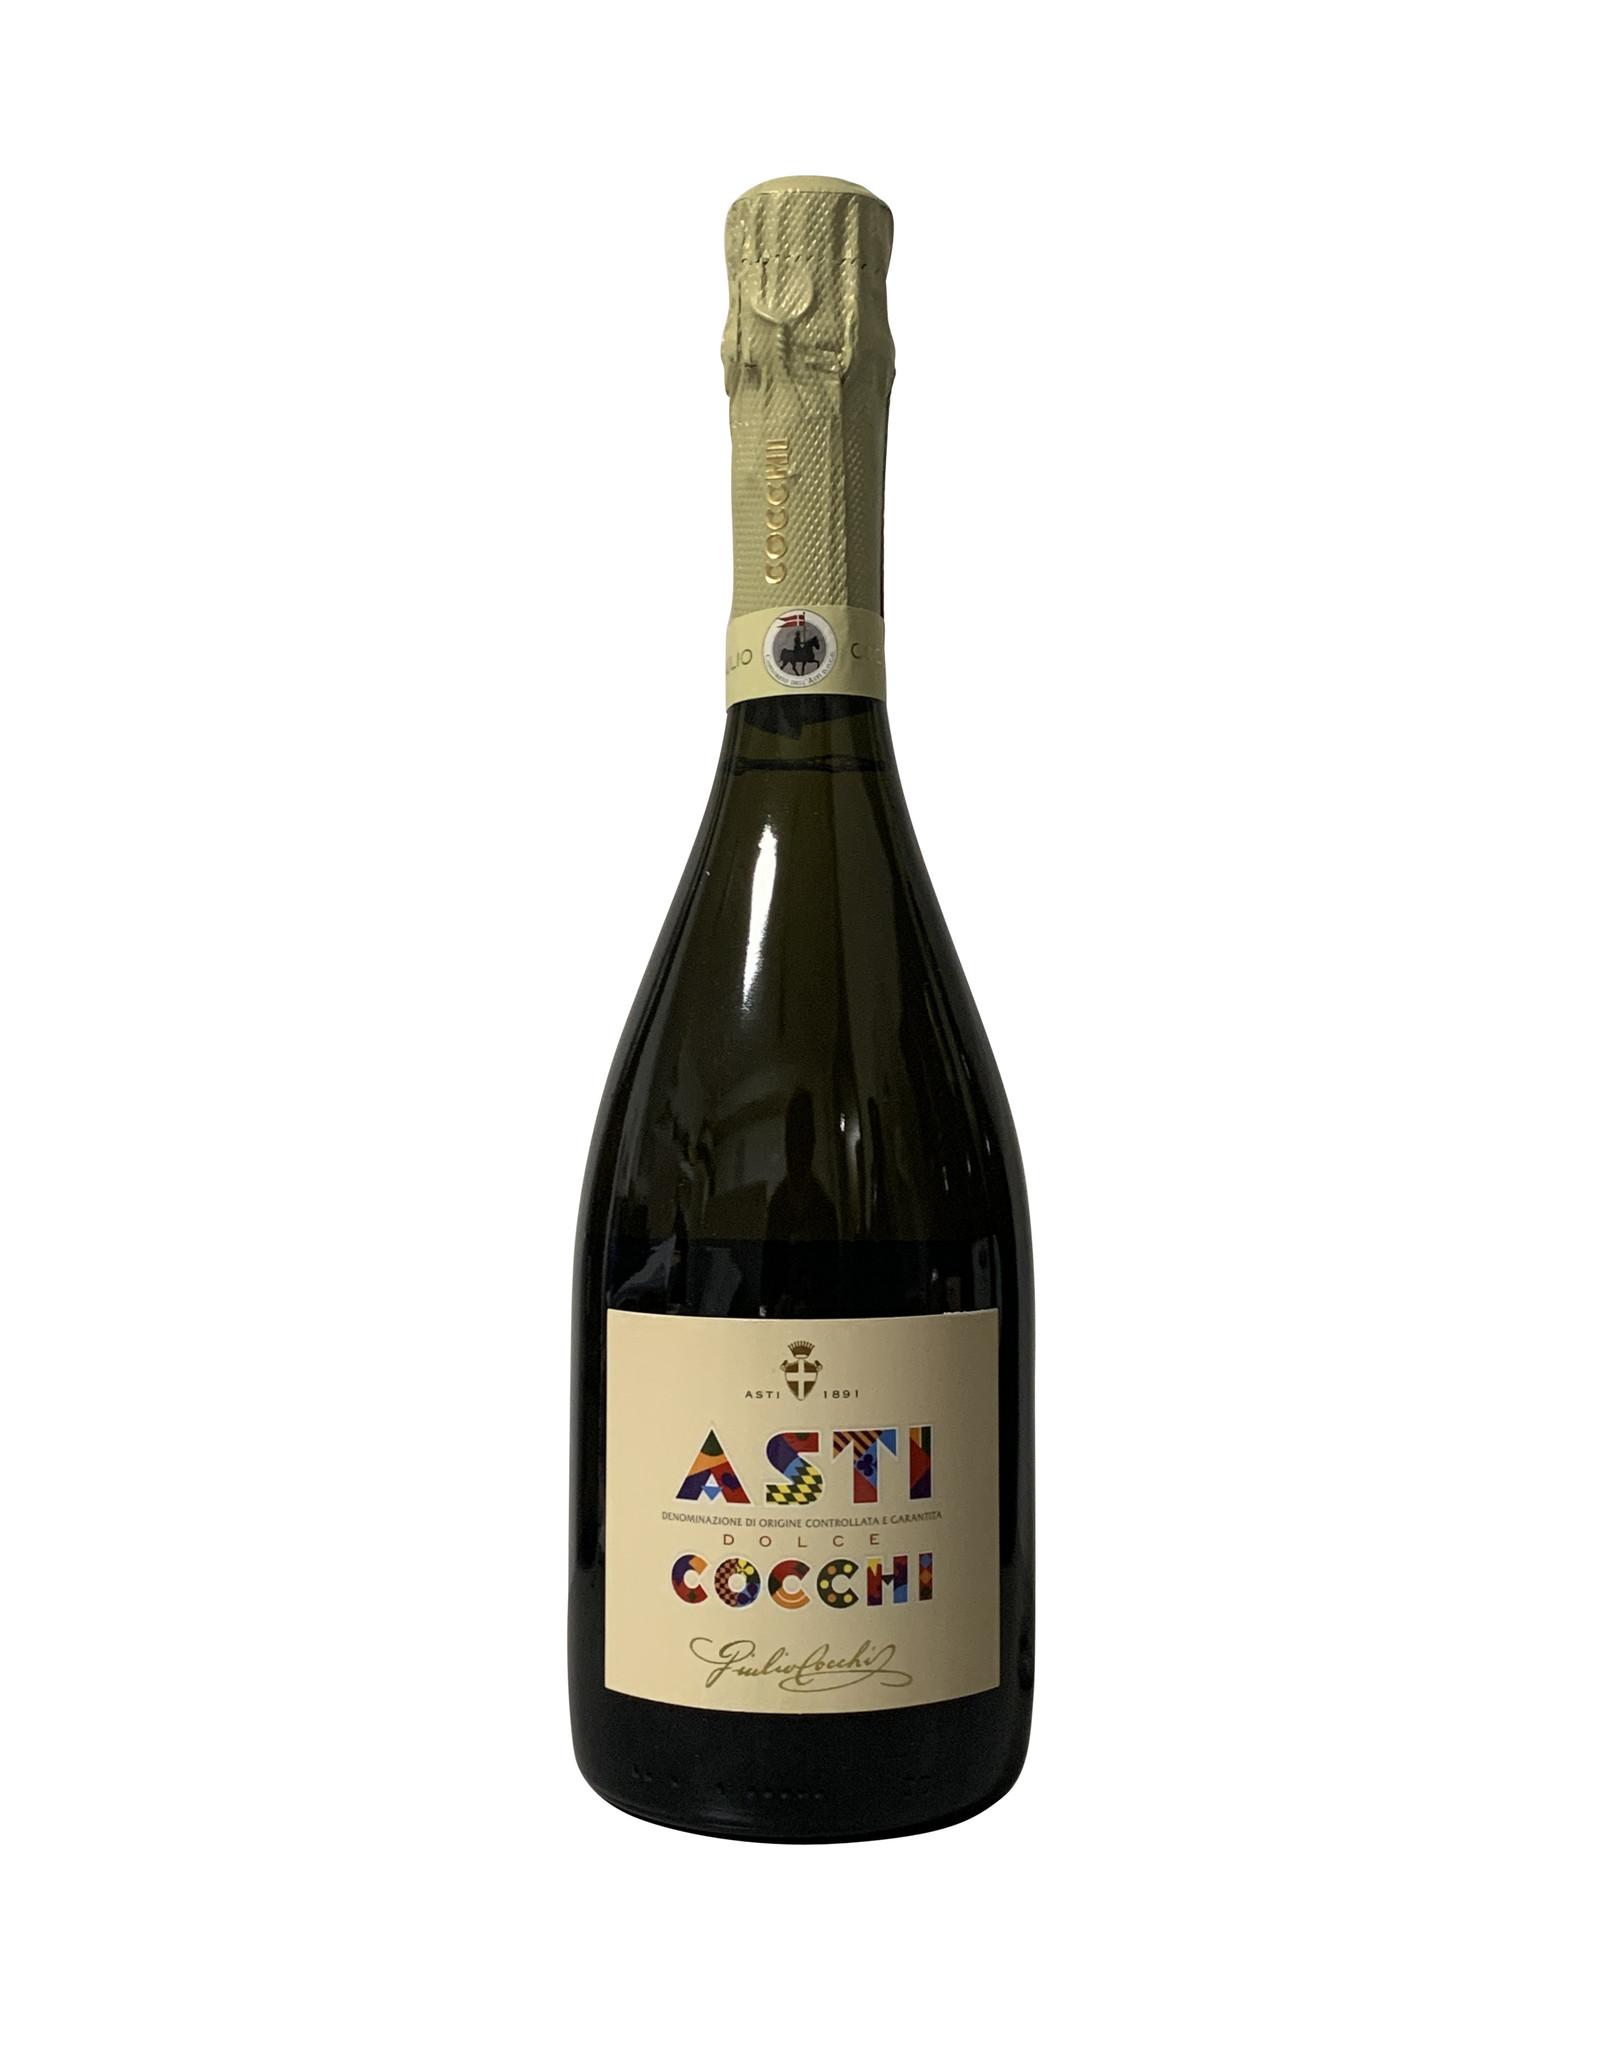 Cocchi Cocchi Asti DOCG, Piedmont, Italy (750mL)